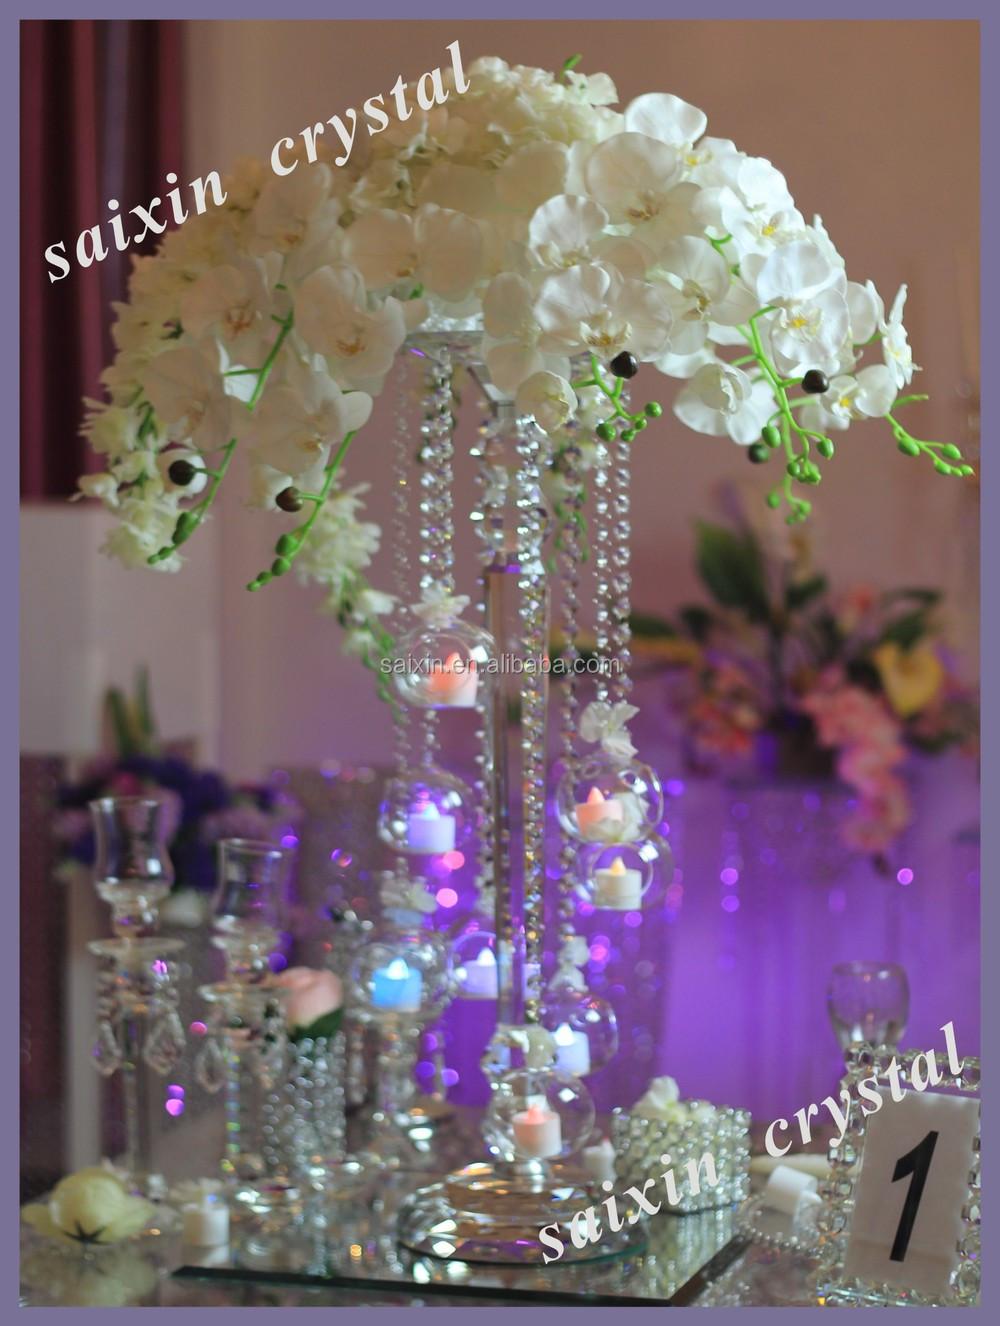 New Design Wedding Crystal Centerpiece Hanging Votive Candle Holder ZT 203 View